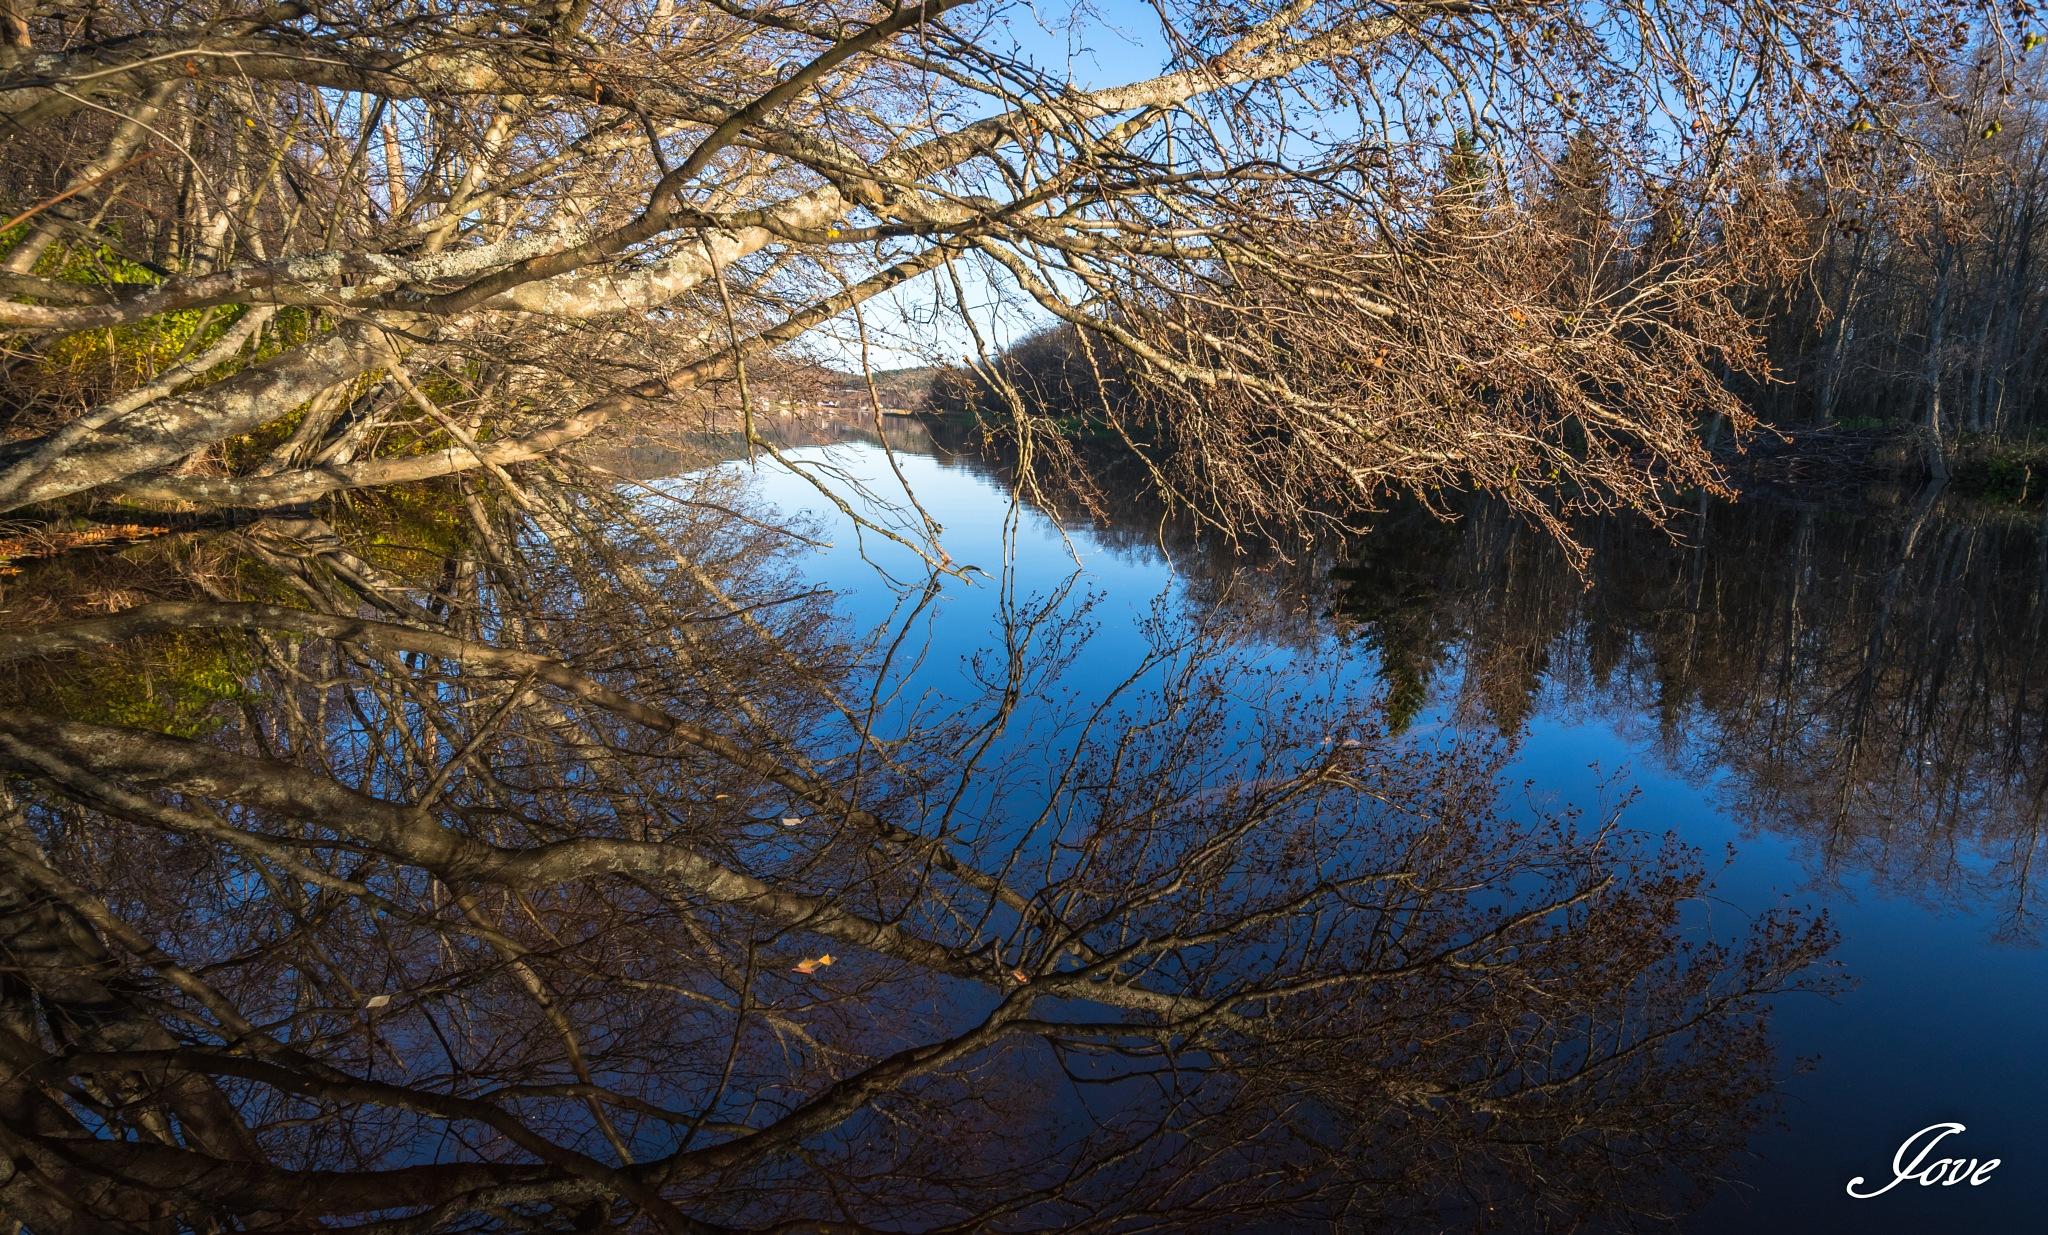 Water/Mirror by Jan-Ove Nordin